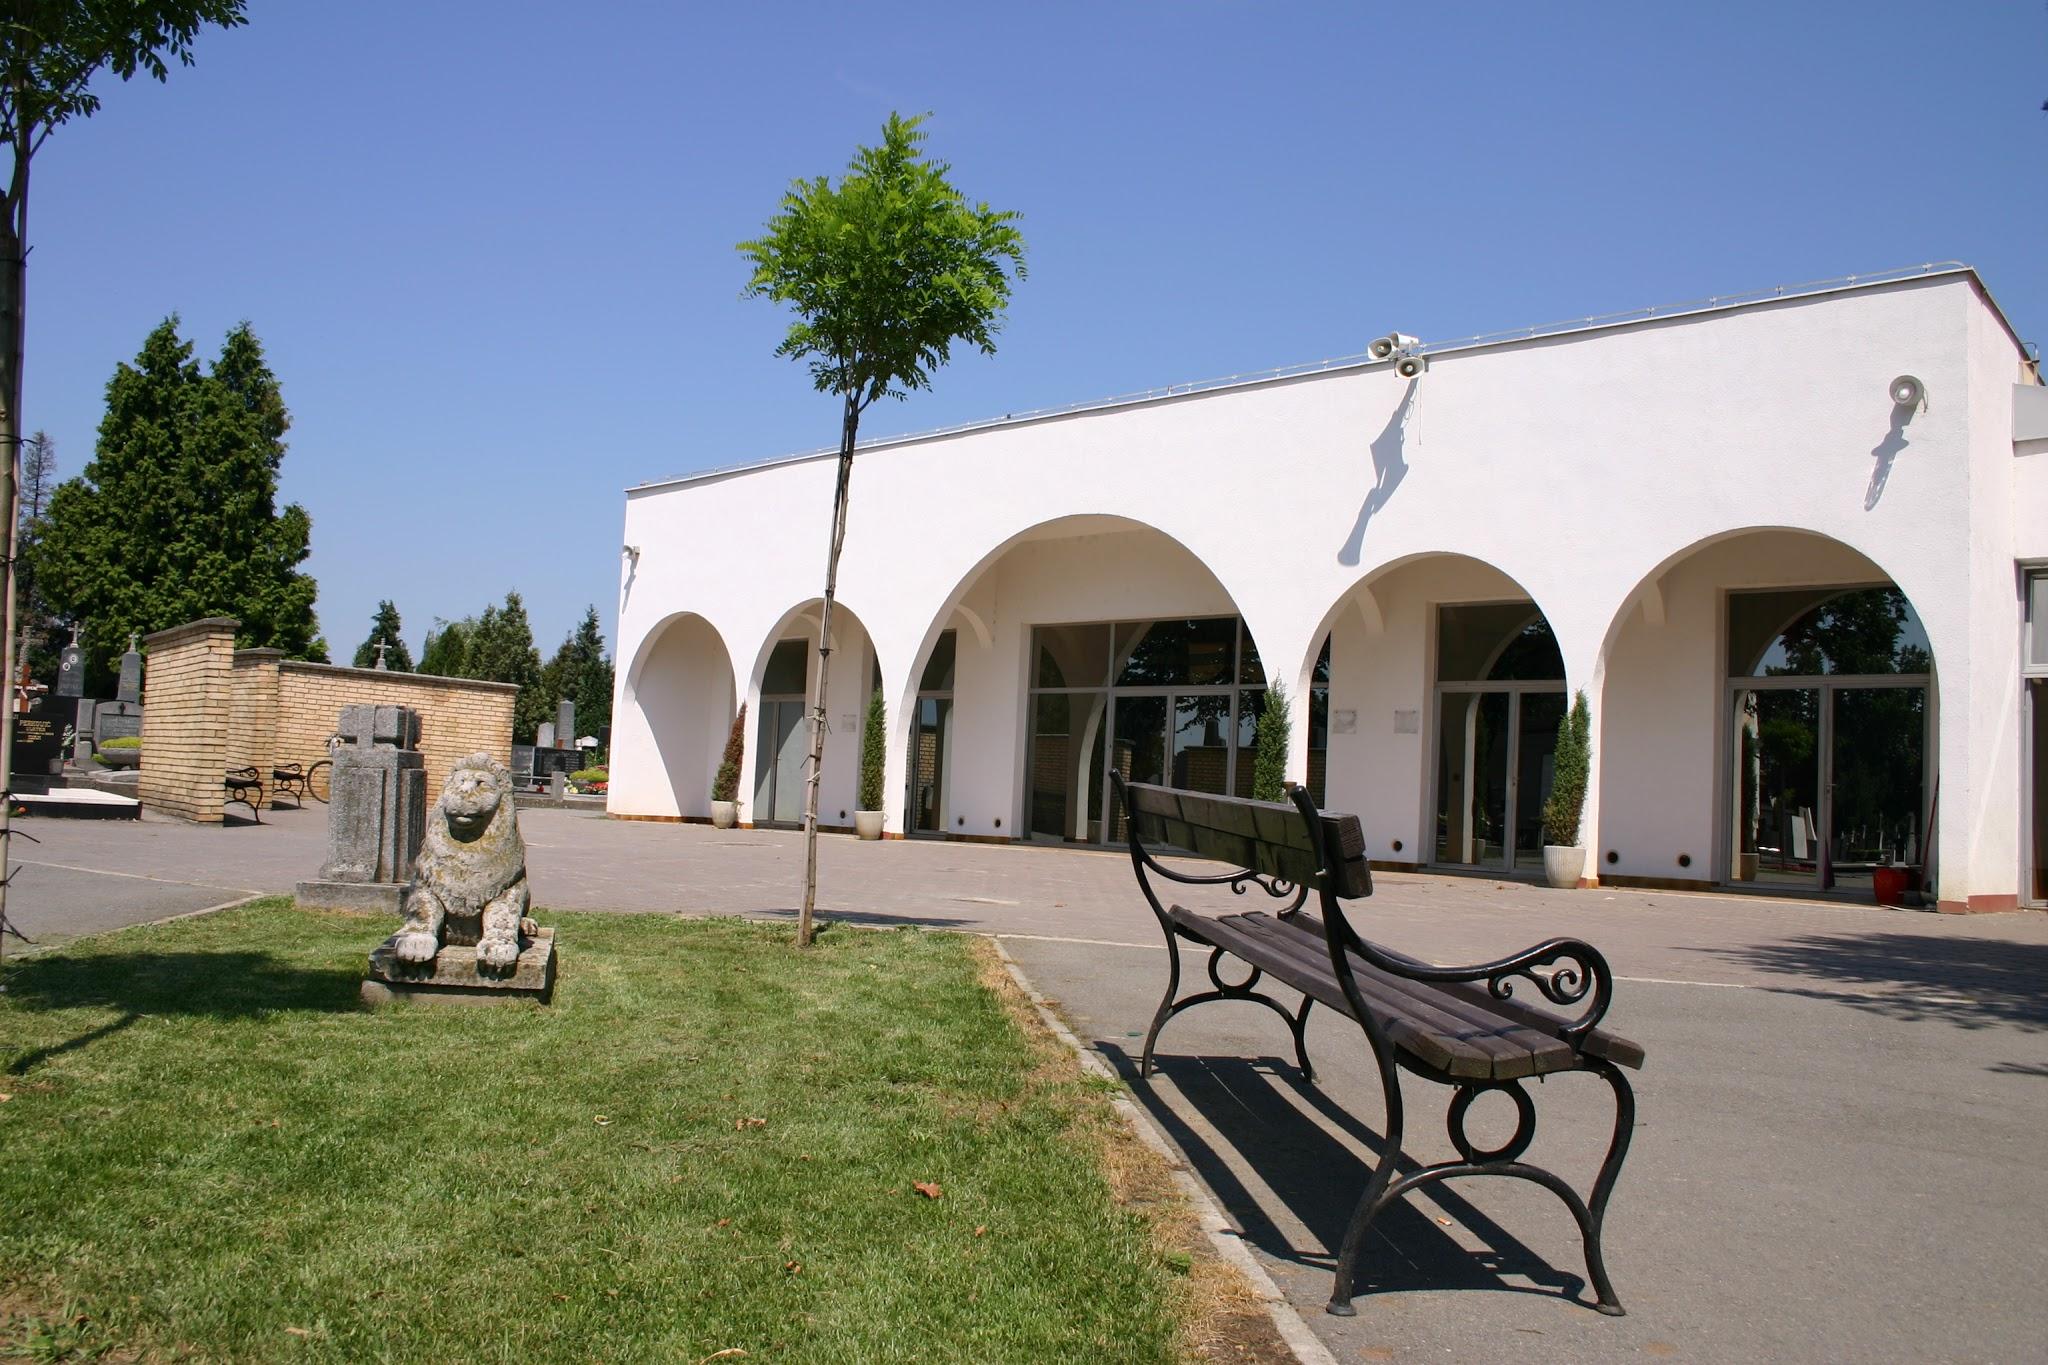 St. Ana Cemetery (Osijek, Croatia)